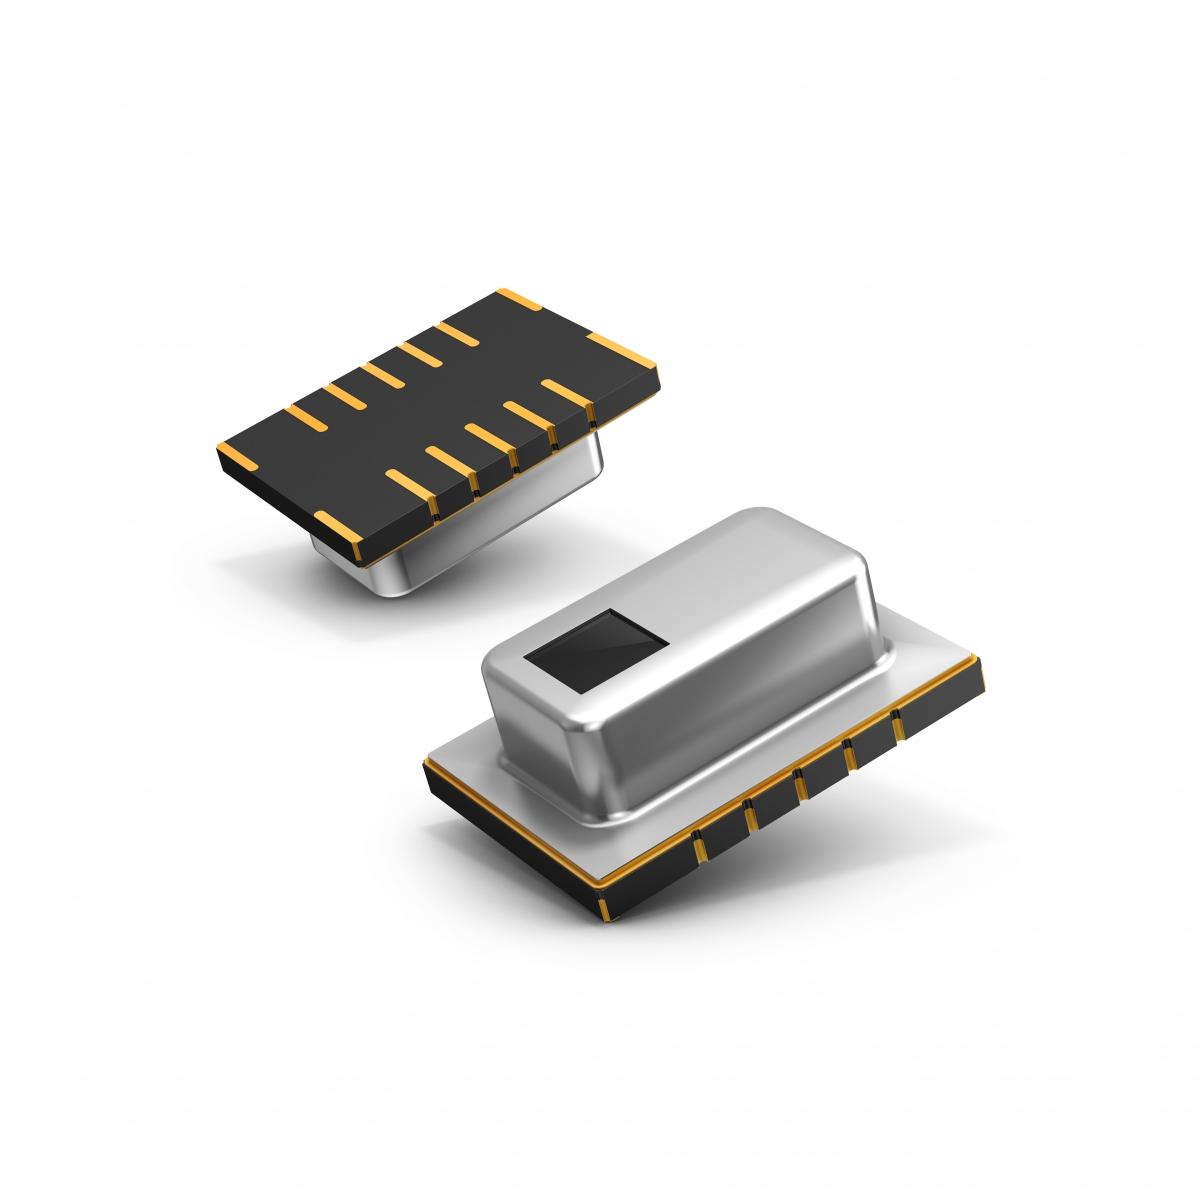 Panasonic releases 'improved' Grid-Eye infrared array sensors